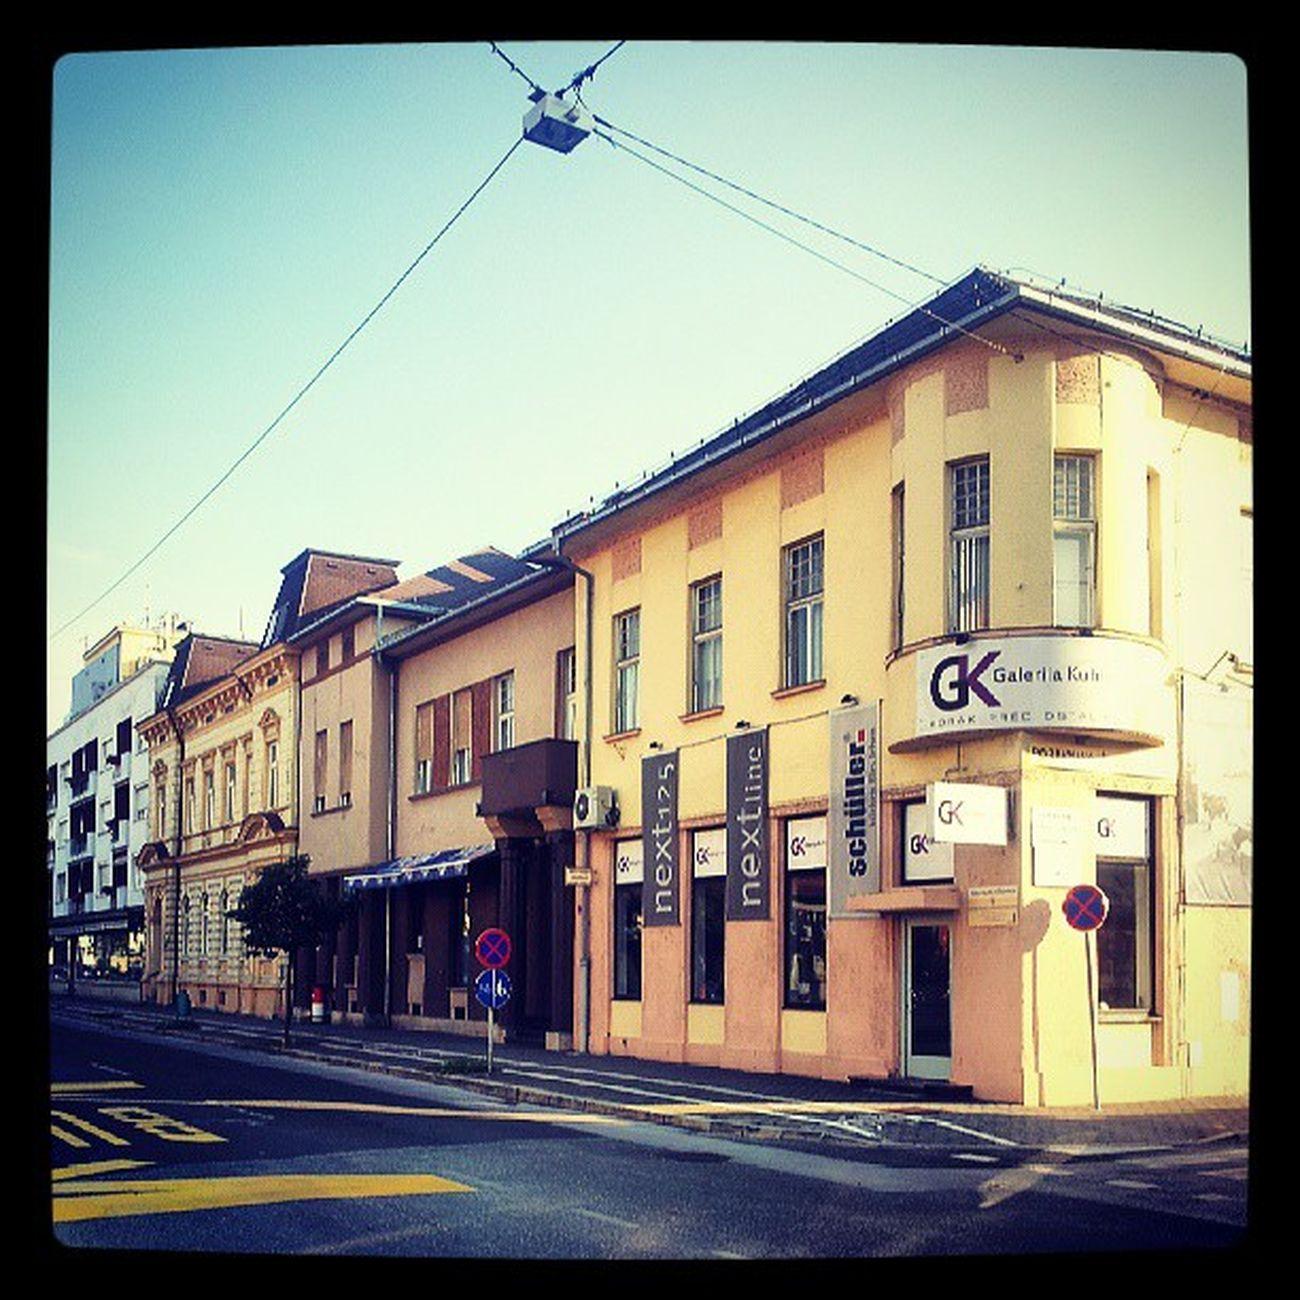 Igslovenia Murska Sobota Salon kuhinj vogal slovenska zvezna ulica